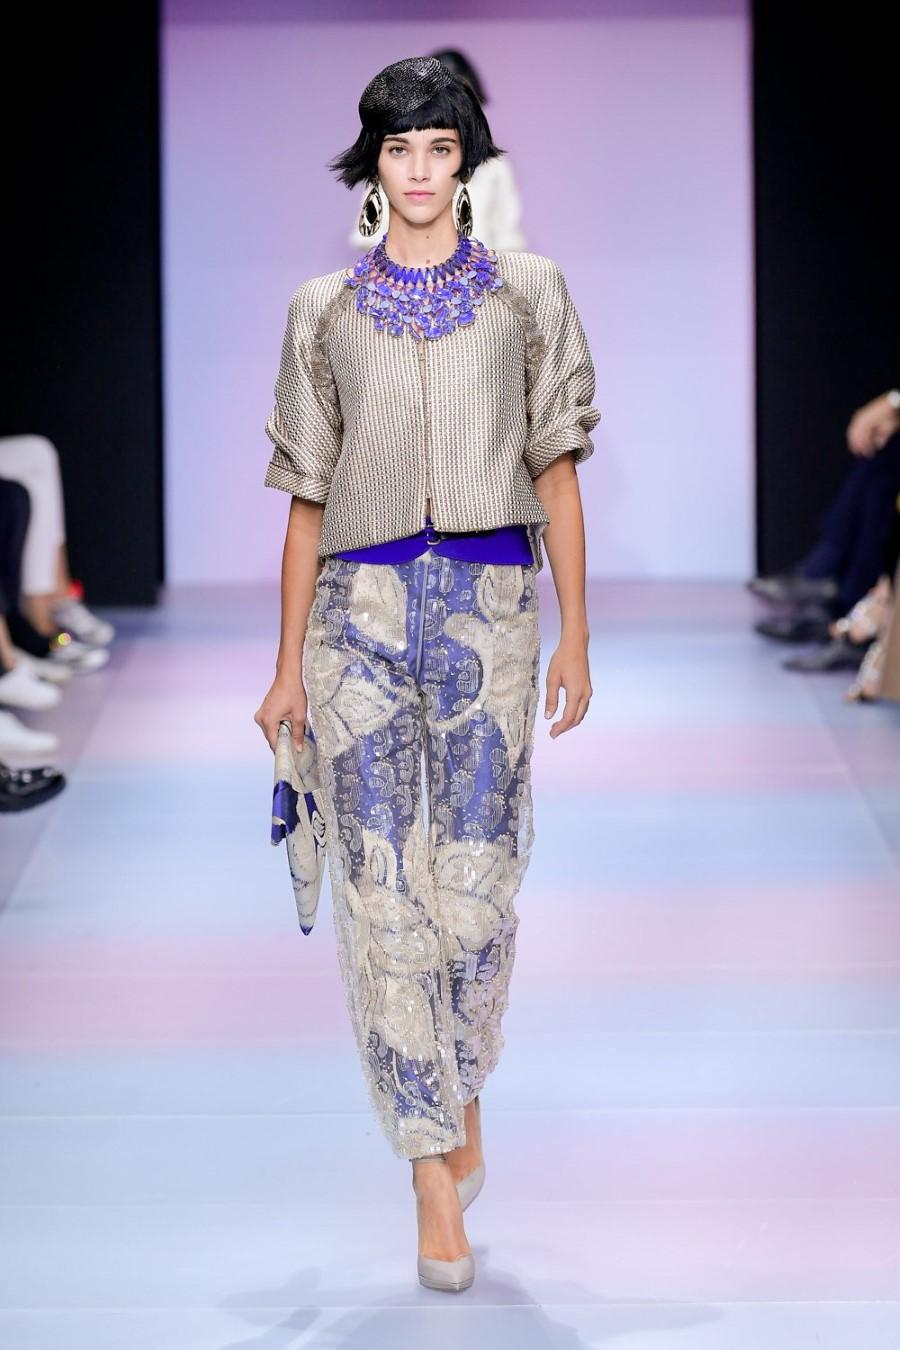 Armani Privé Haute Couture Spring Summer 2020